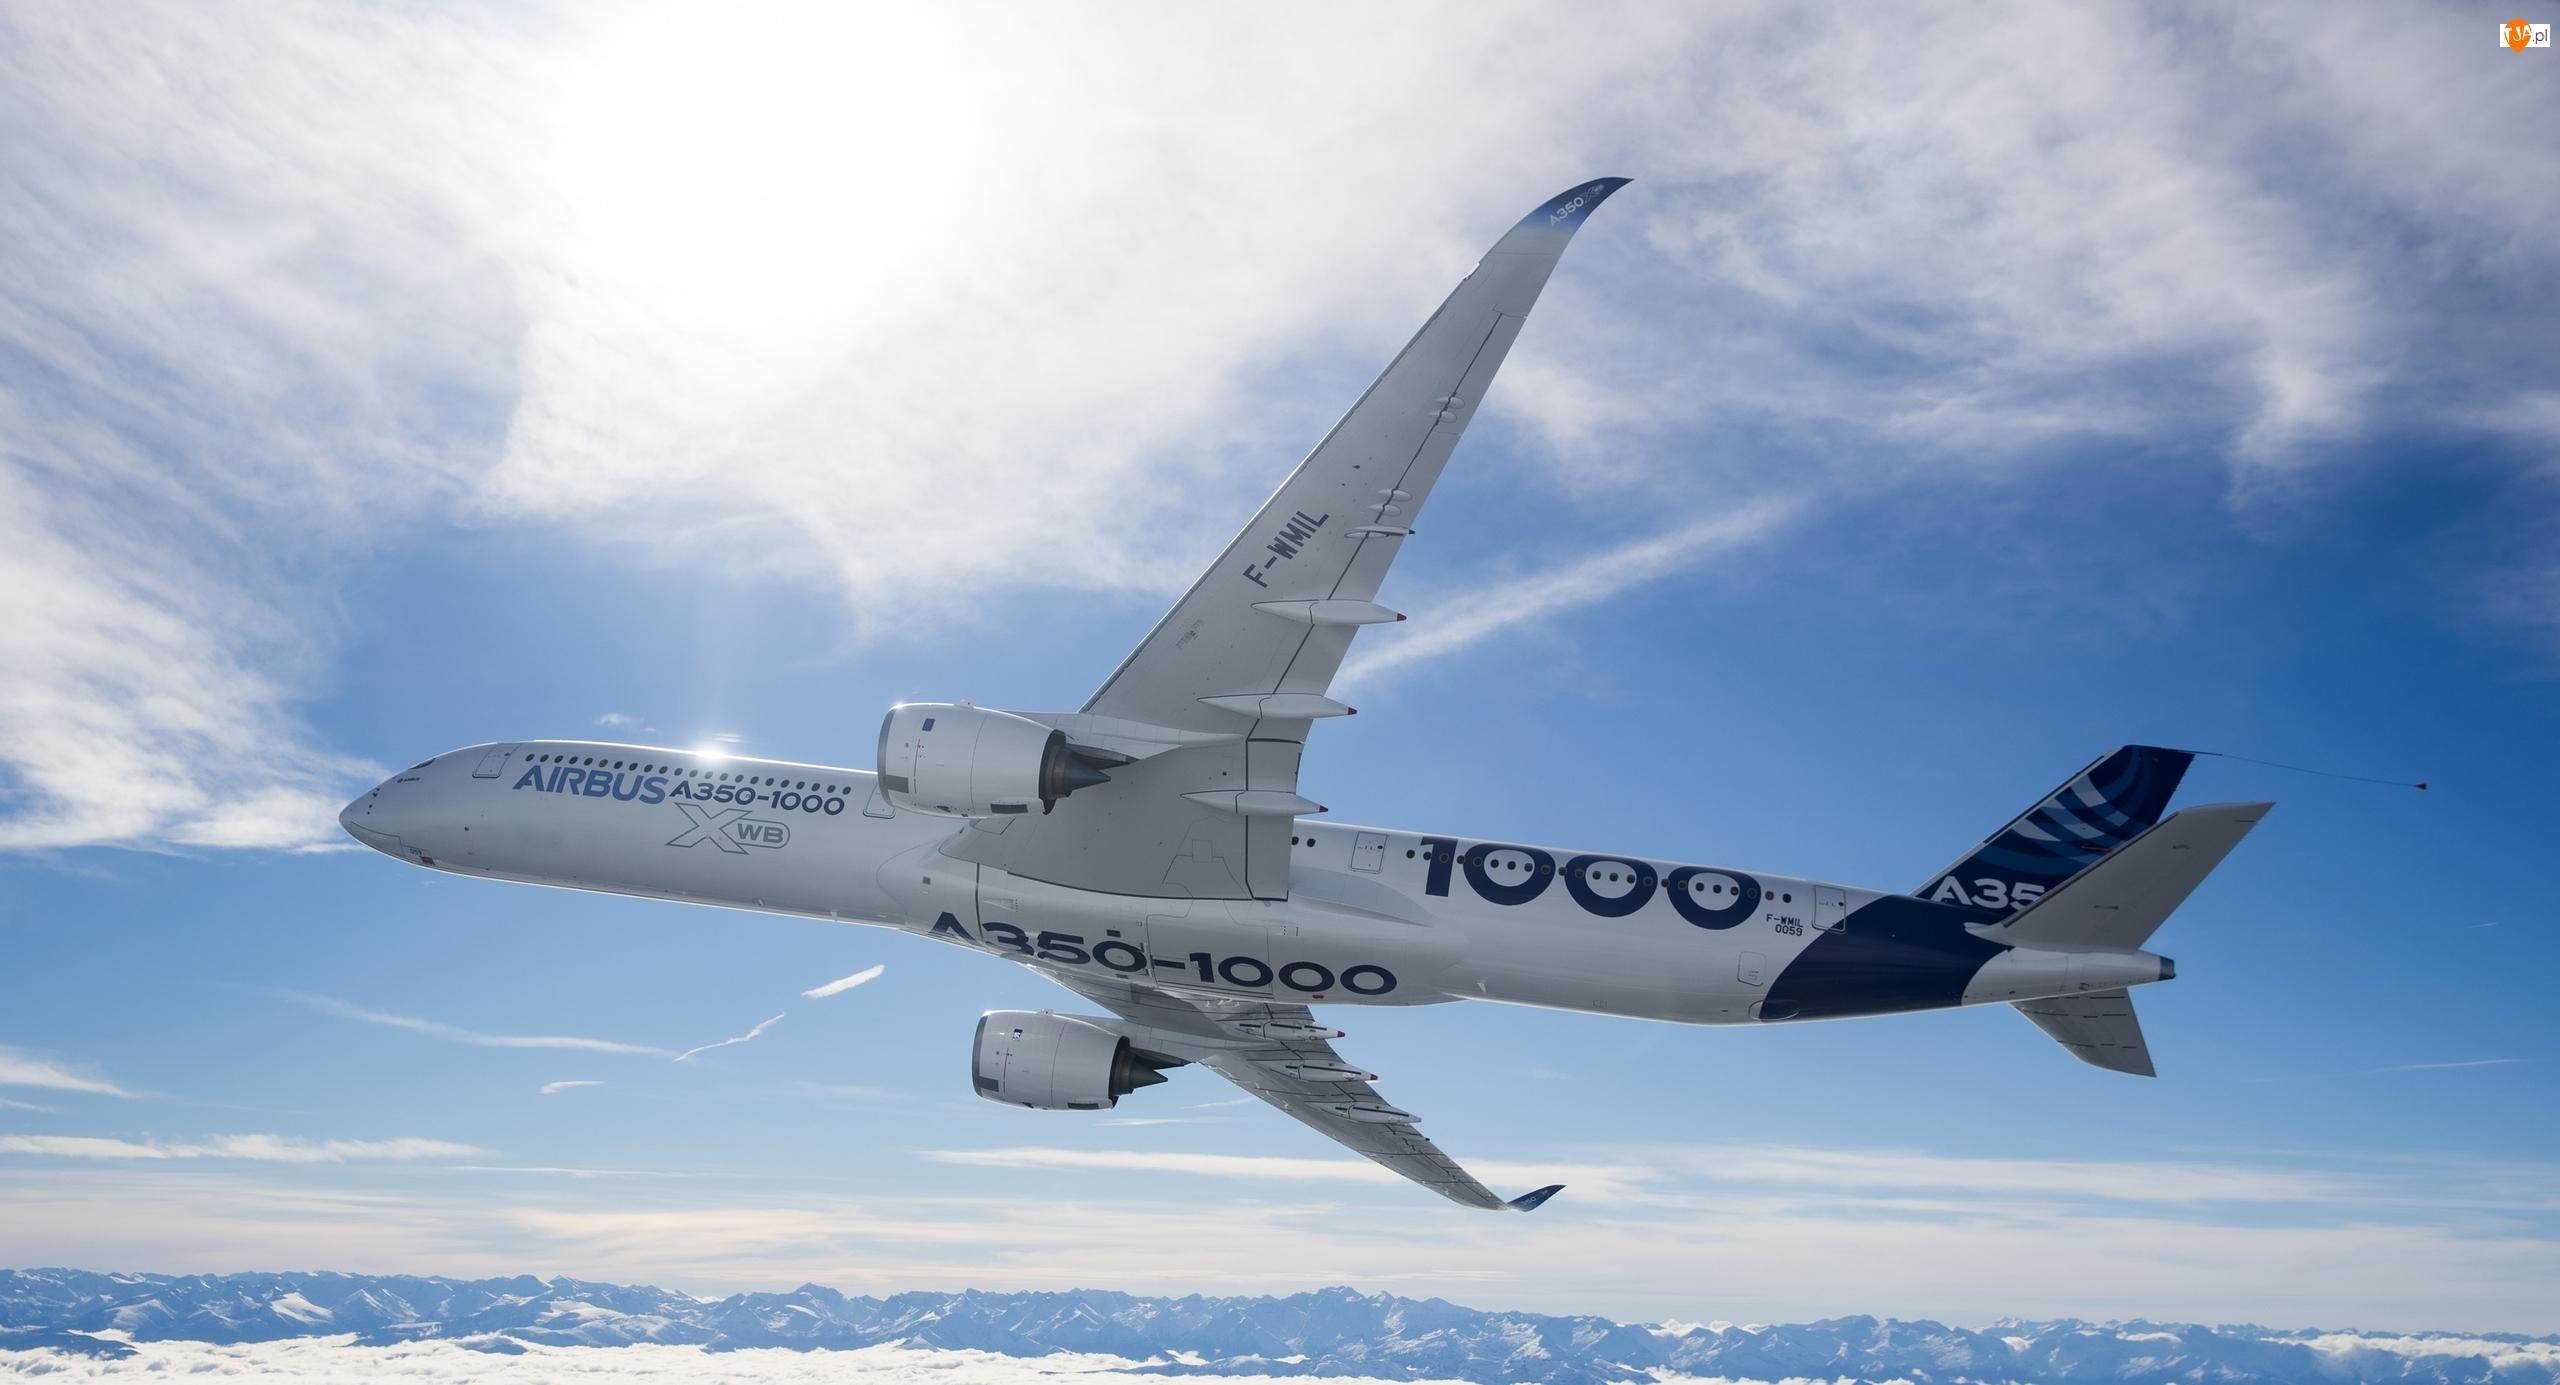 Airbus A350-1000 XWB, Samolot pasażerski